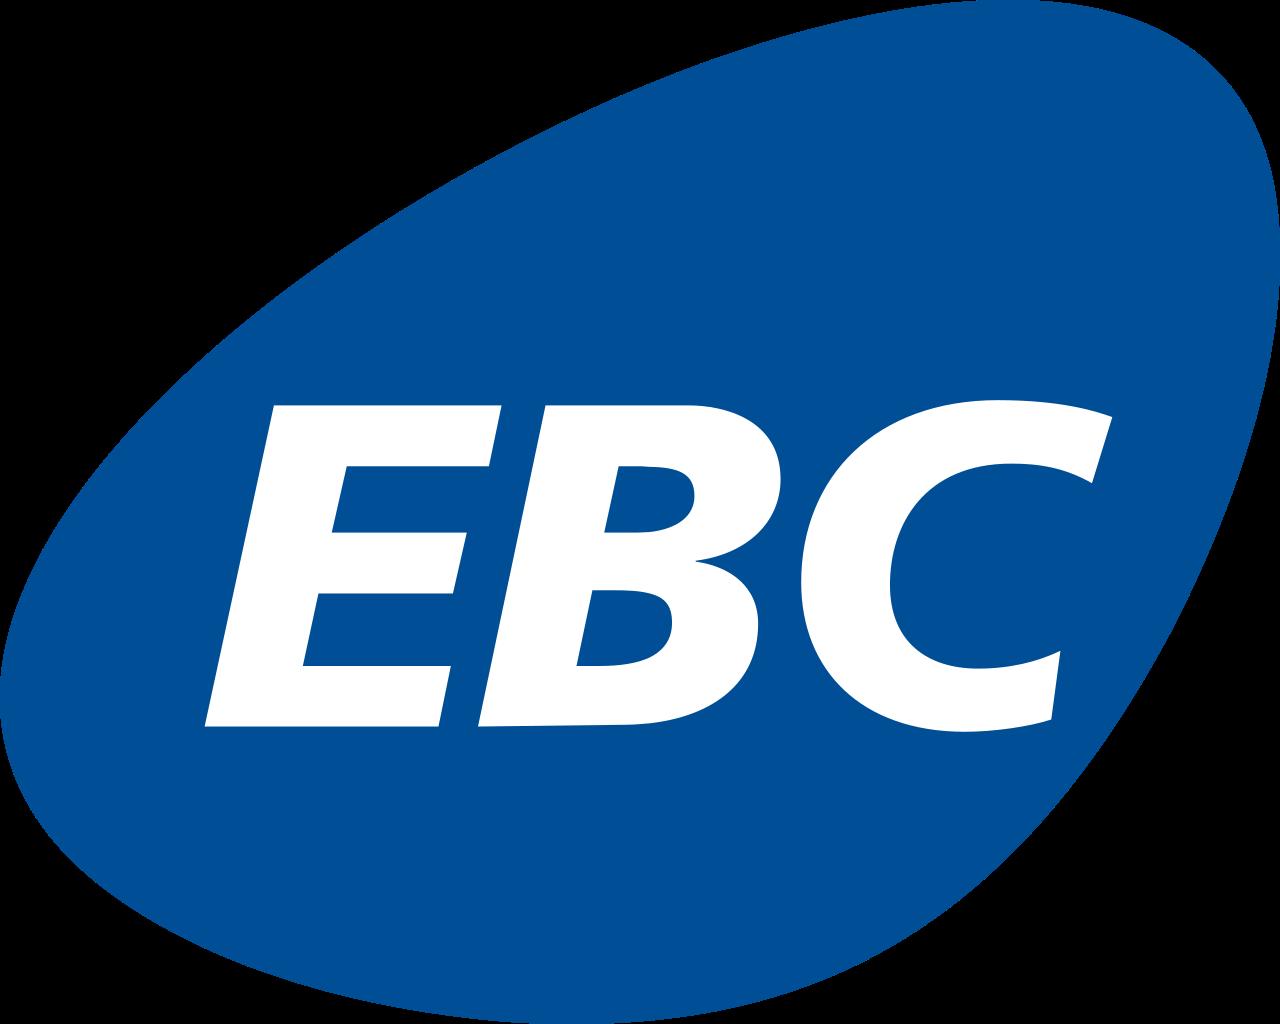 File:EBC logo.svg.